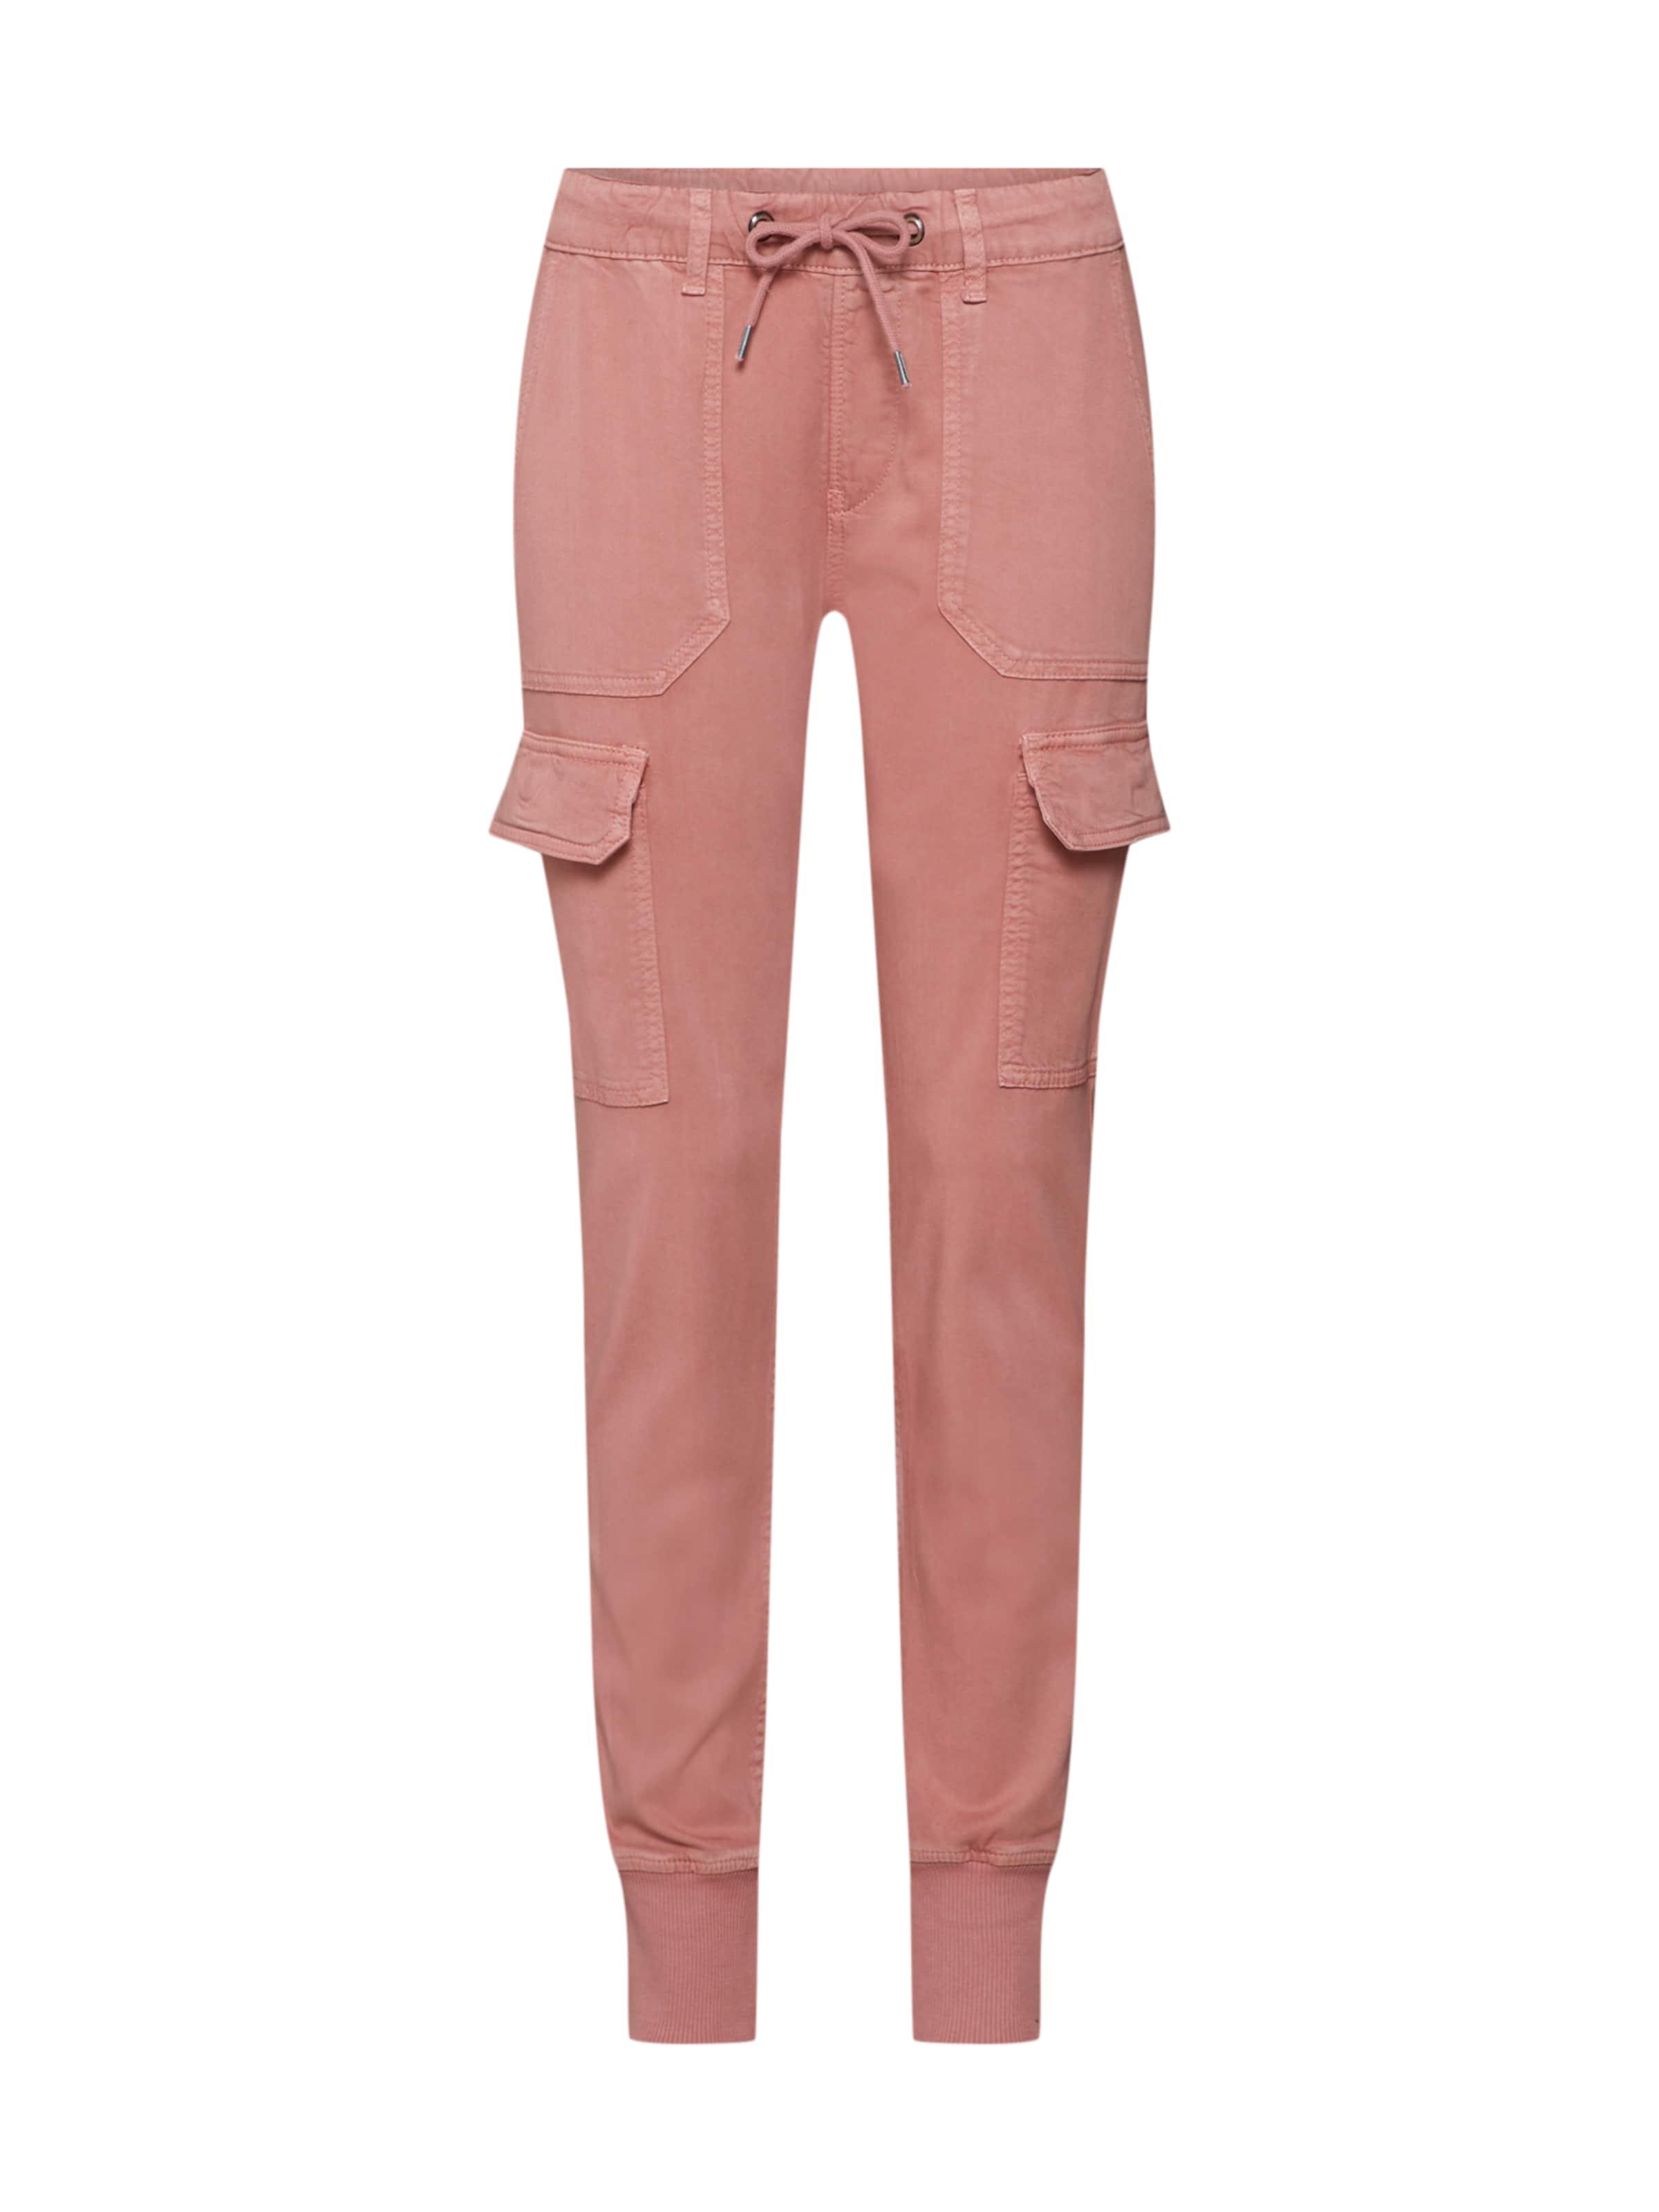 Pepe 'crusade' Rouille Pantalon En Jeans Rouge hQdsxrCt